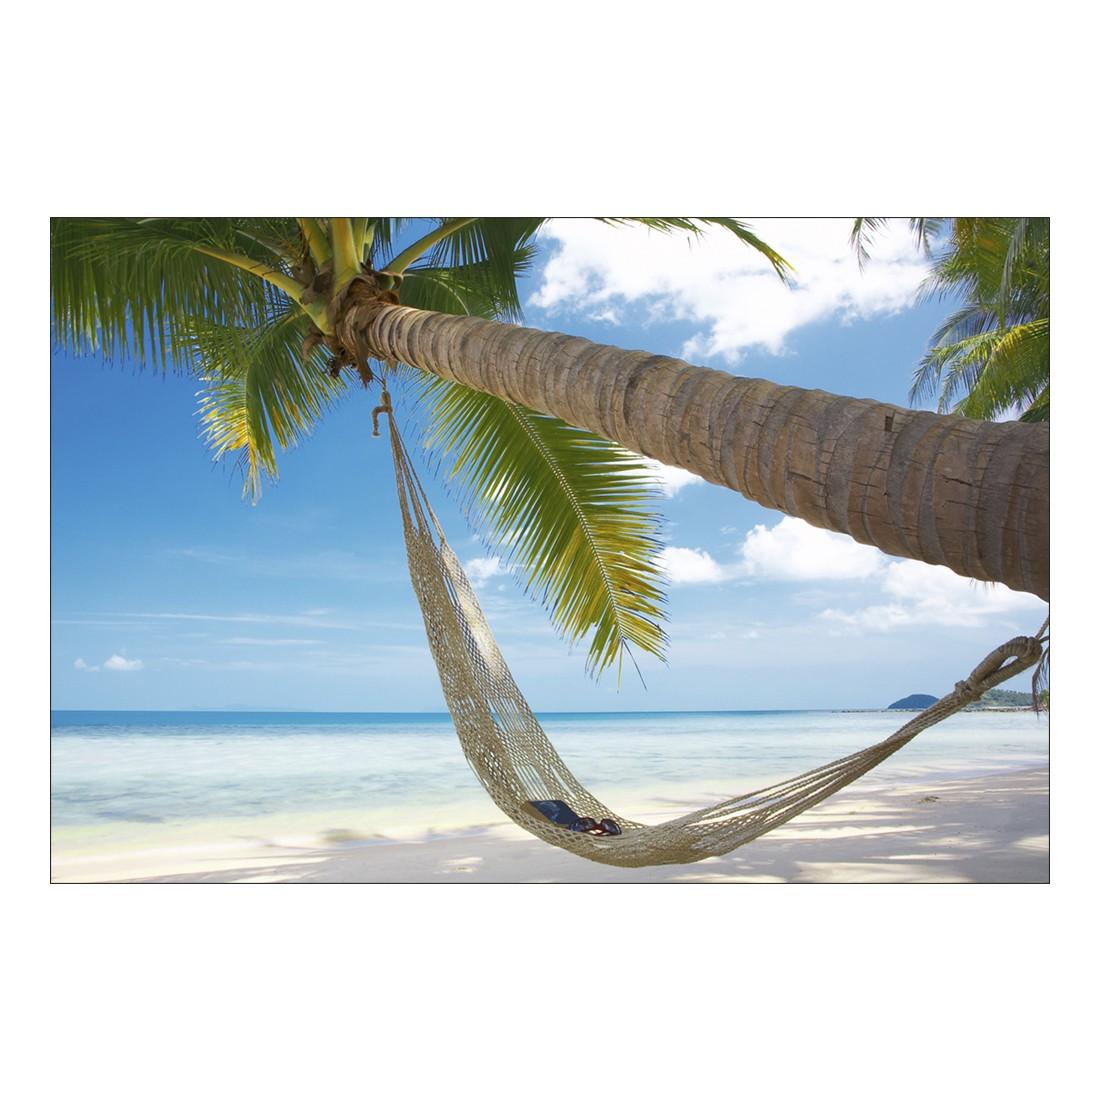 Acrylglasbild Caribbean Chill – Abmessung 75×50 cm, Gallery of Innovative Art online kaufen